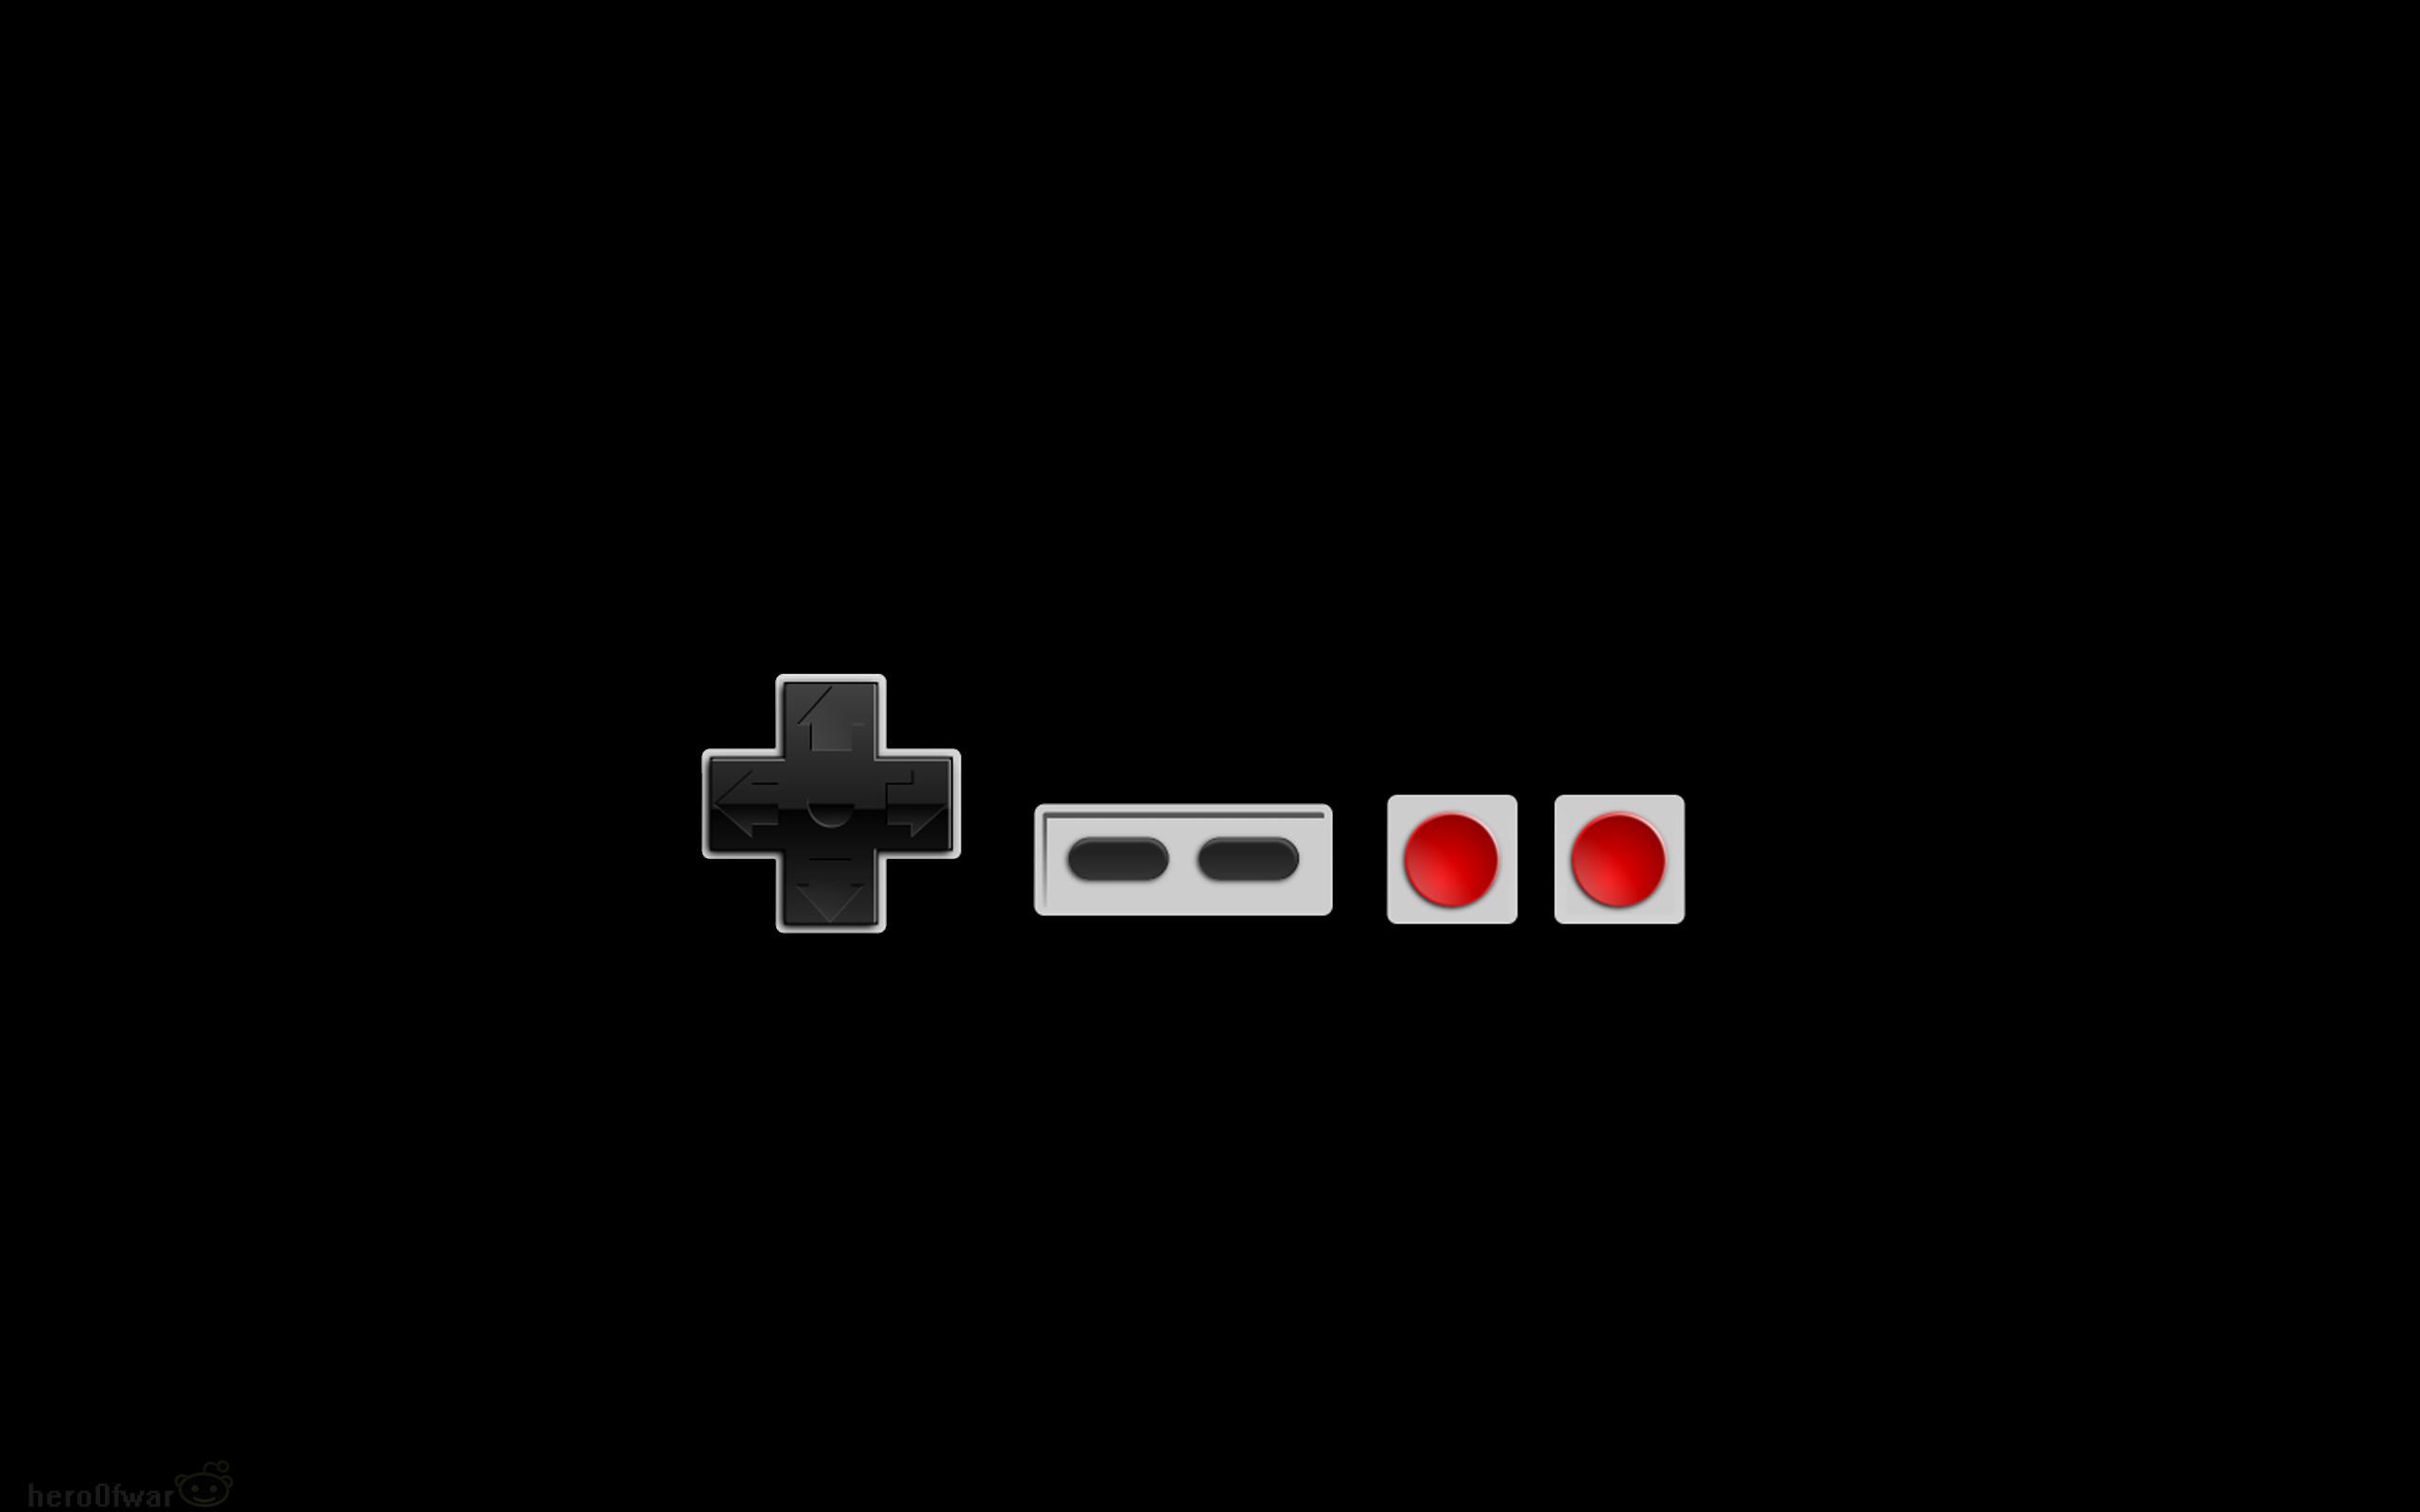 Nintendo Iphone Wallpaper 74 Images